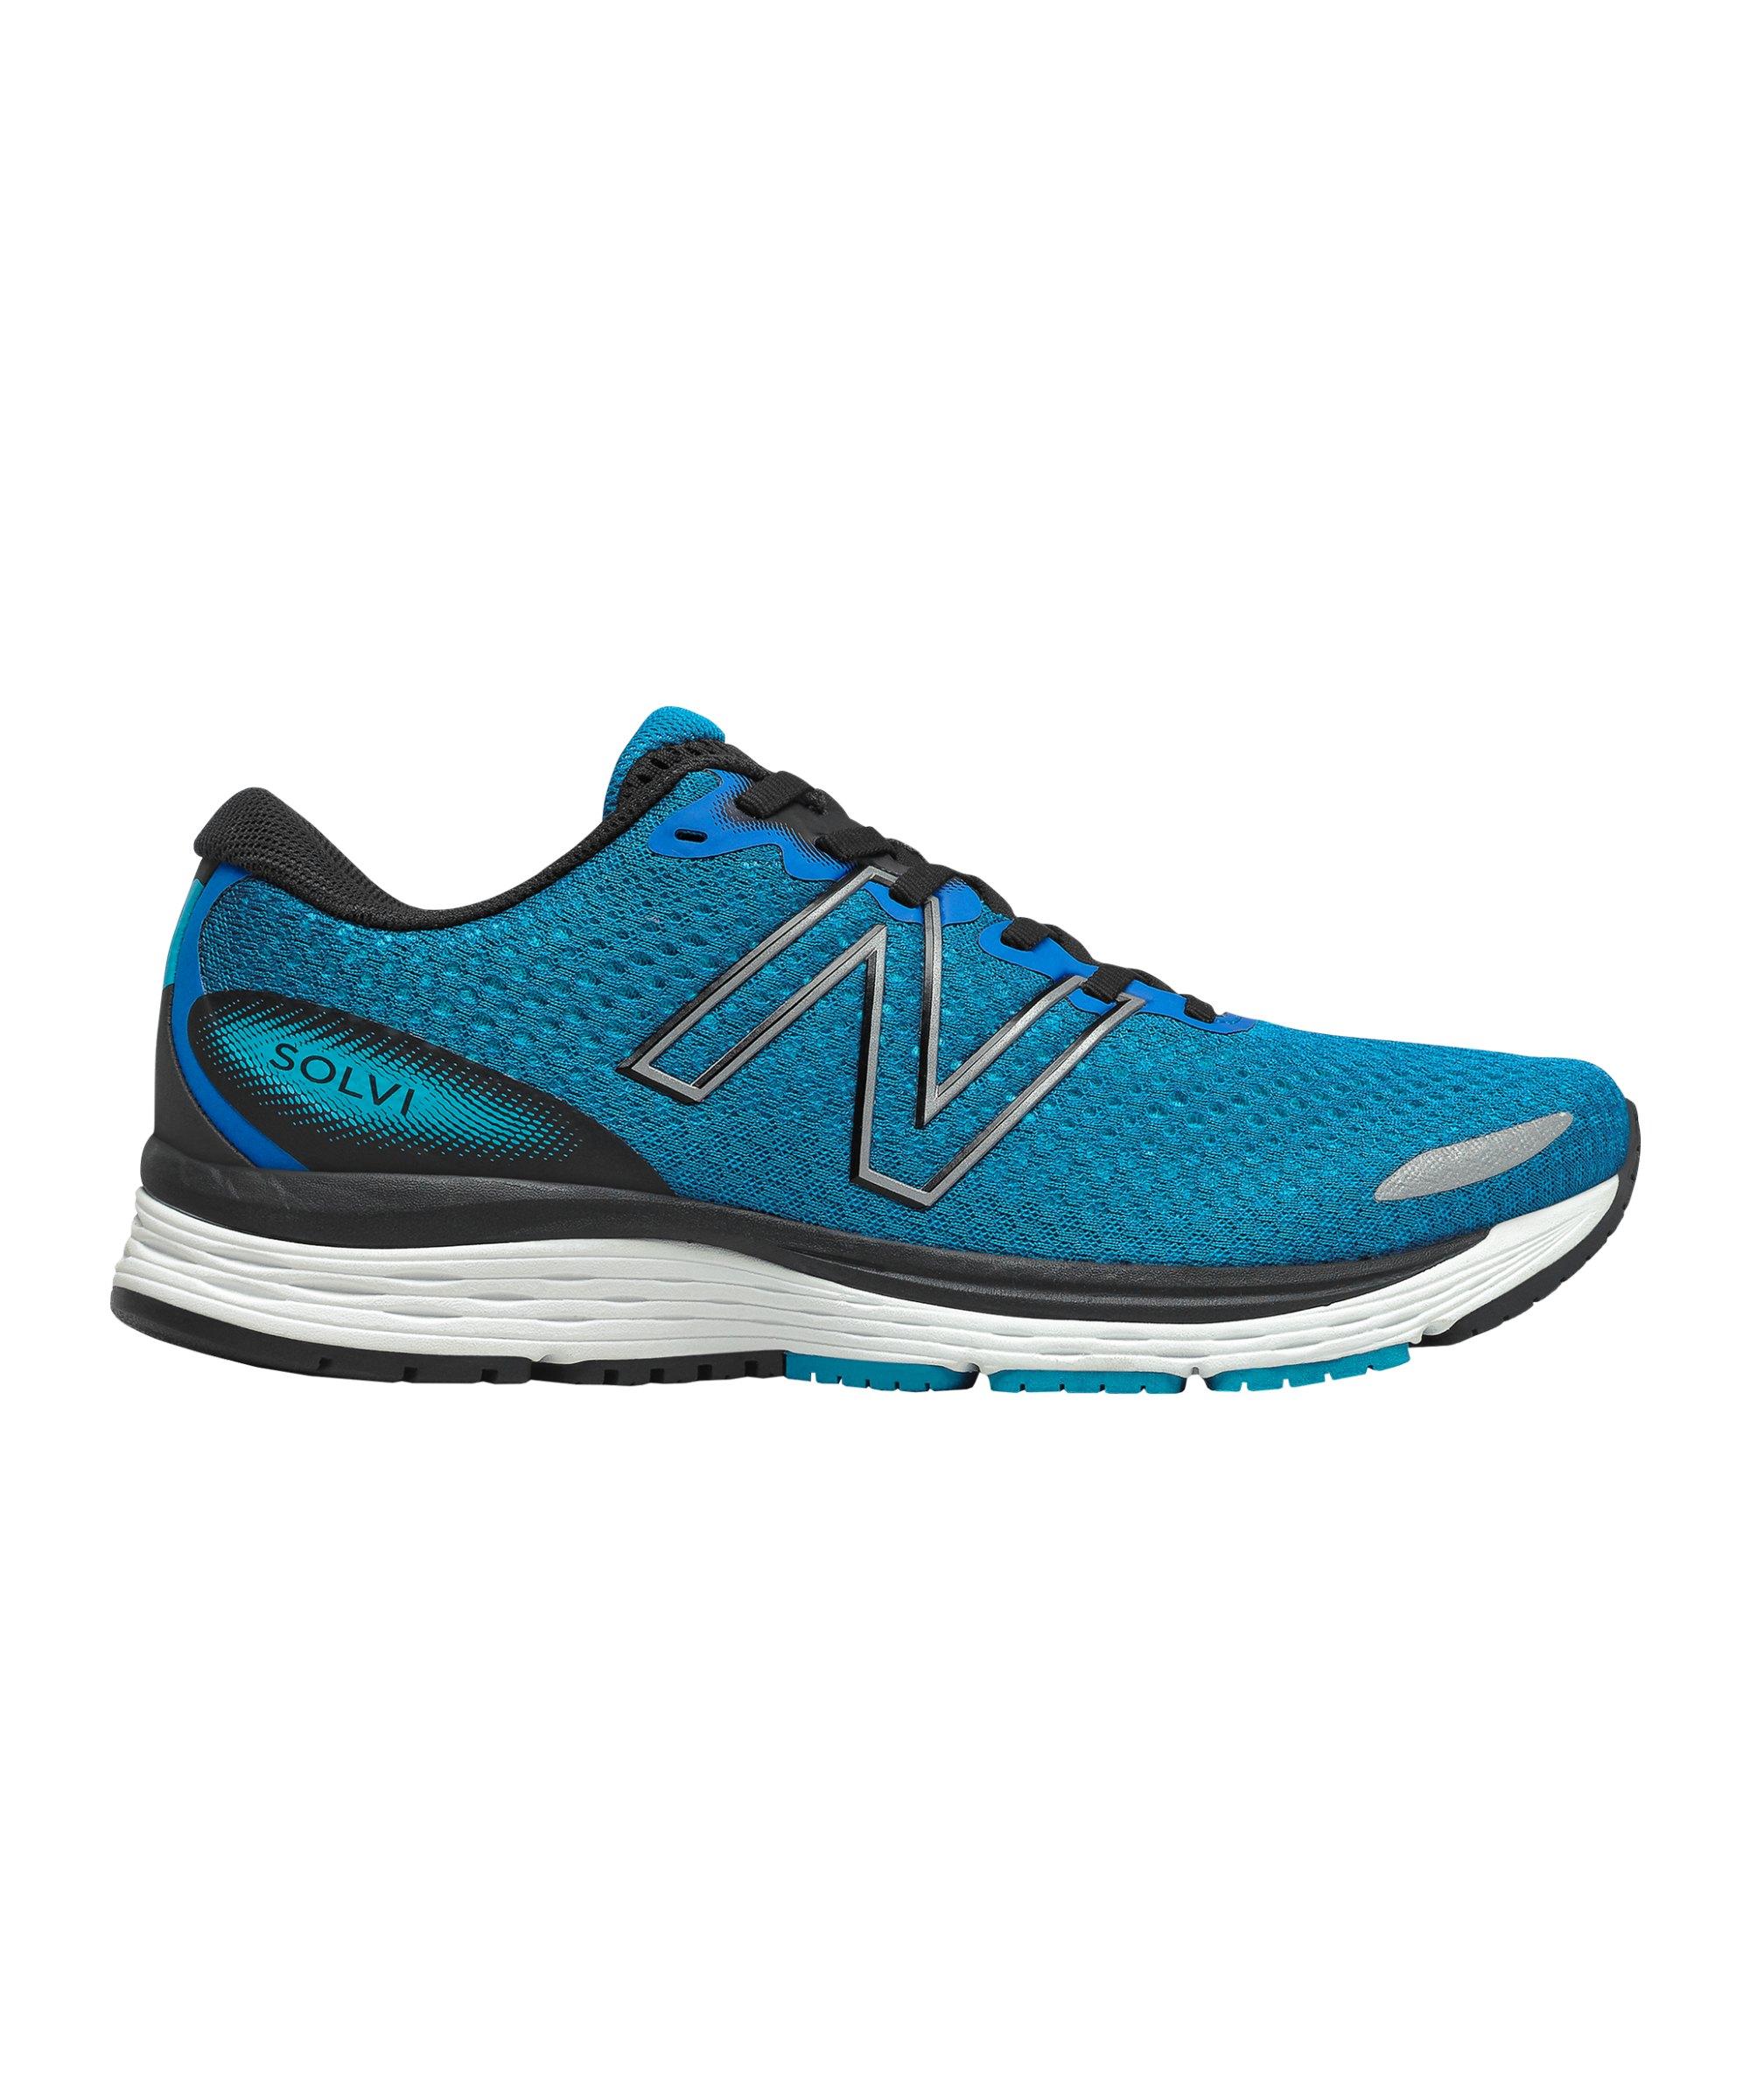 New Balance MSOLV Running Blau Schwarz FLB3 - blau